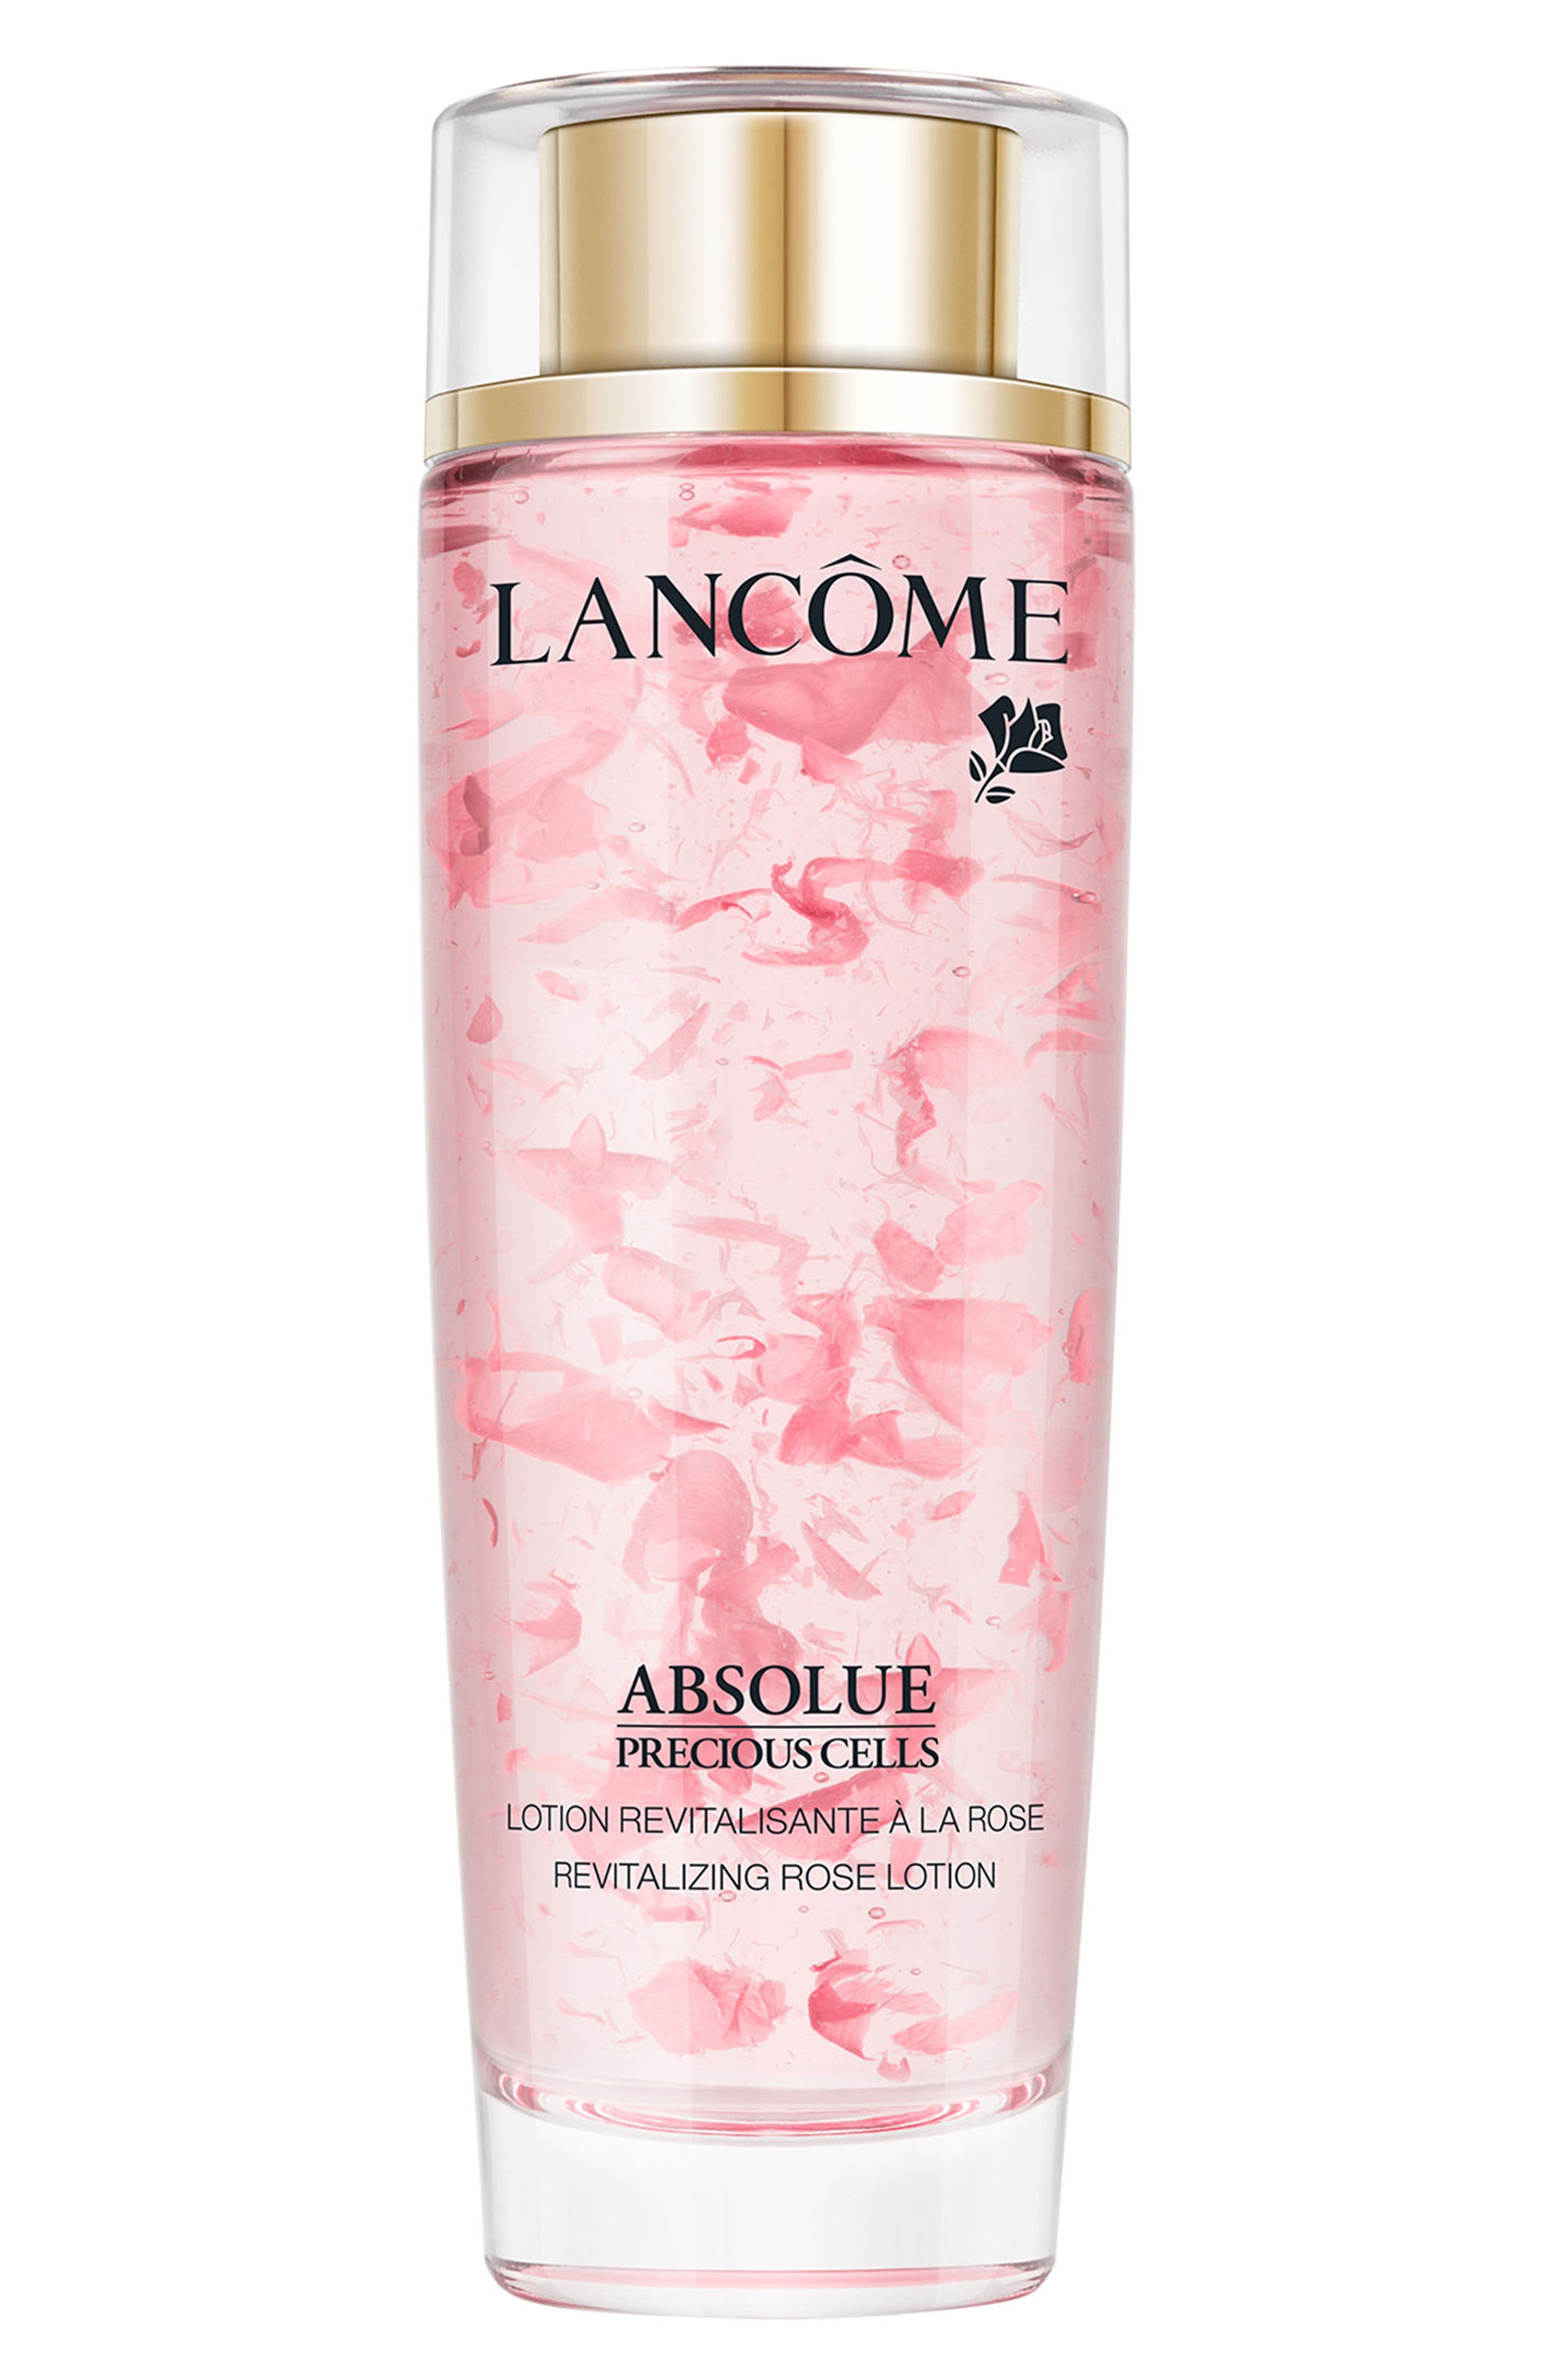 Alternate Image 1 Selected - Lancôme Absolue Precious Cells Revitalizing Rose Lotion Toner